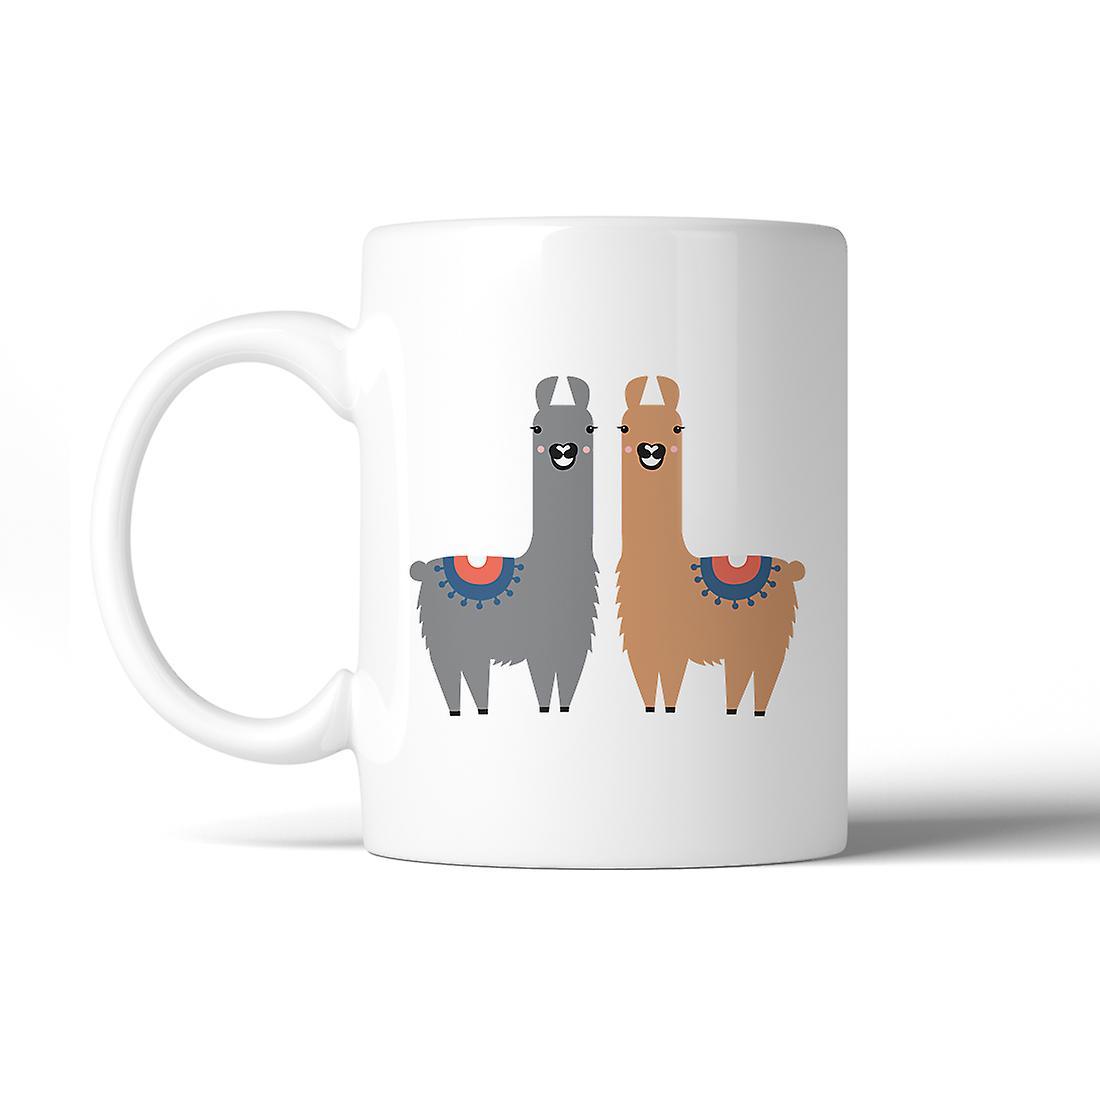 Safe Pattern Ceramic Mug Dishwasher Llama Coffee Microwave Gift iPOkZXuT